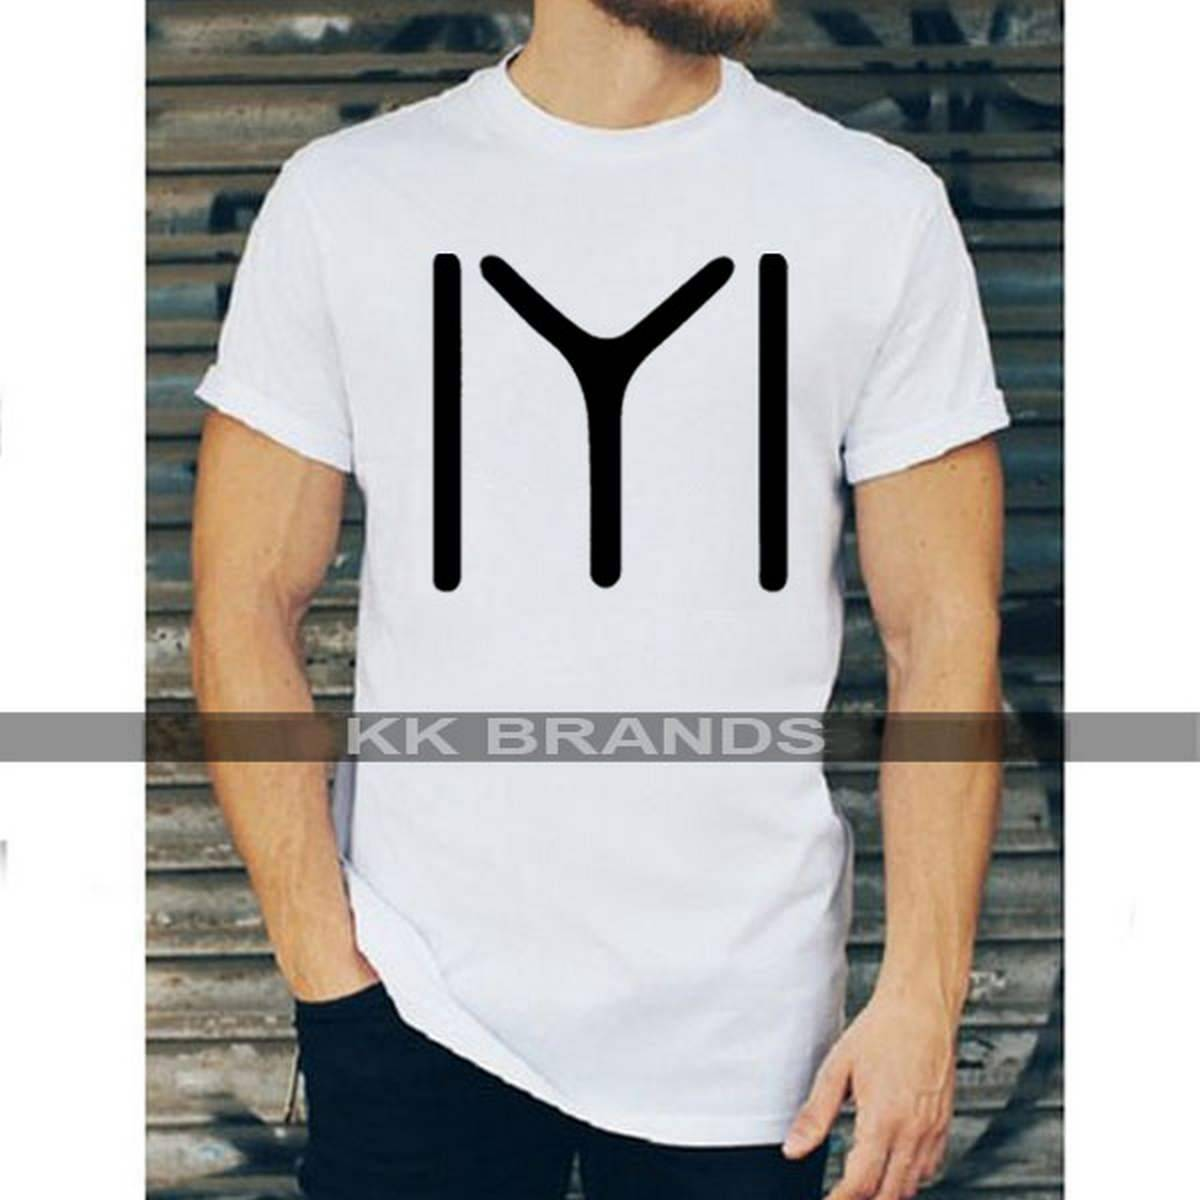 KK Brands New Arrival 2020 Summer t-shirt Half Sleeves Cotton tee Printed T Shirt for Boys Girl